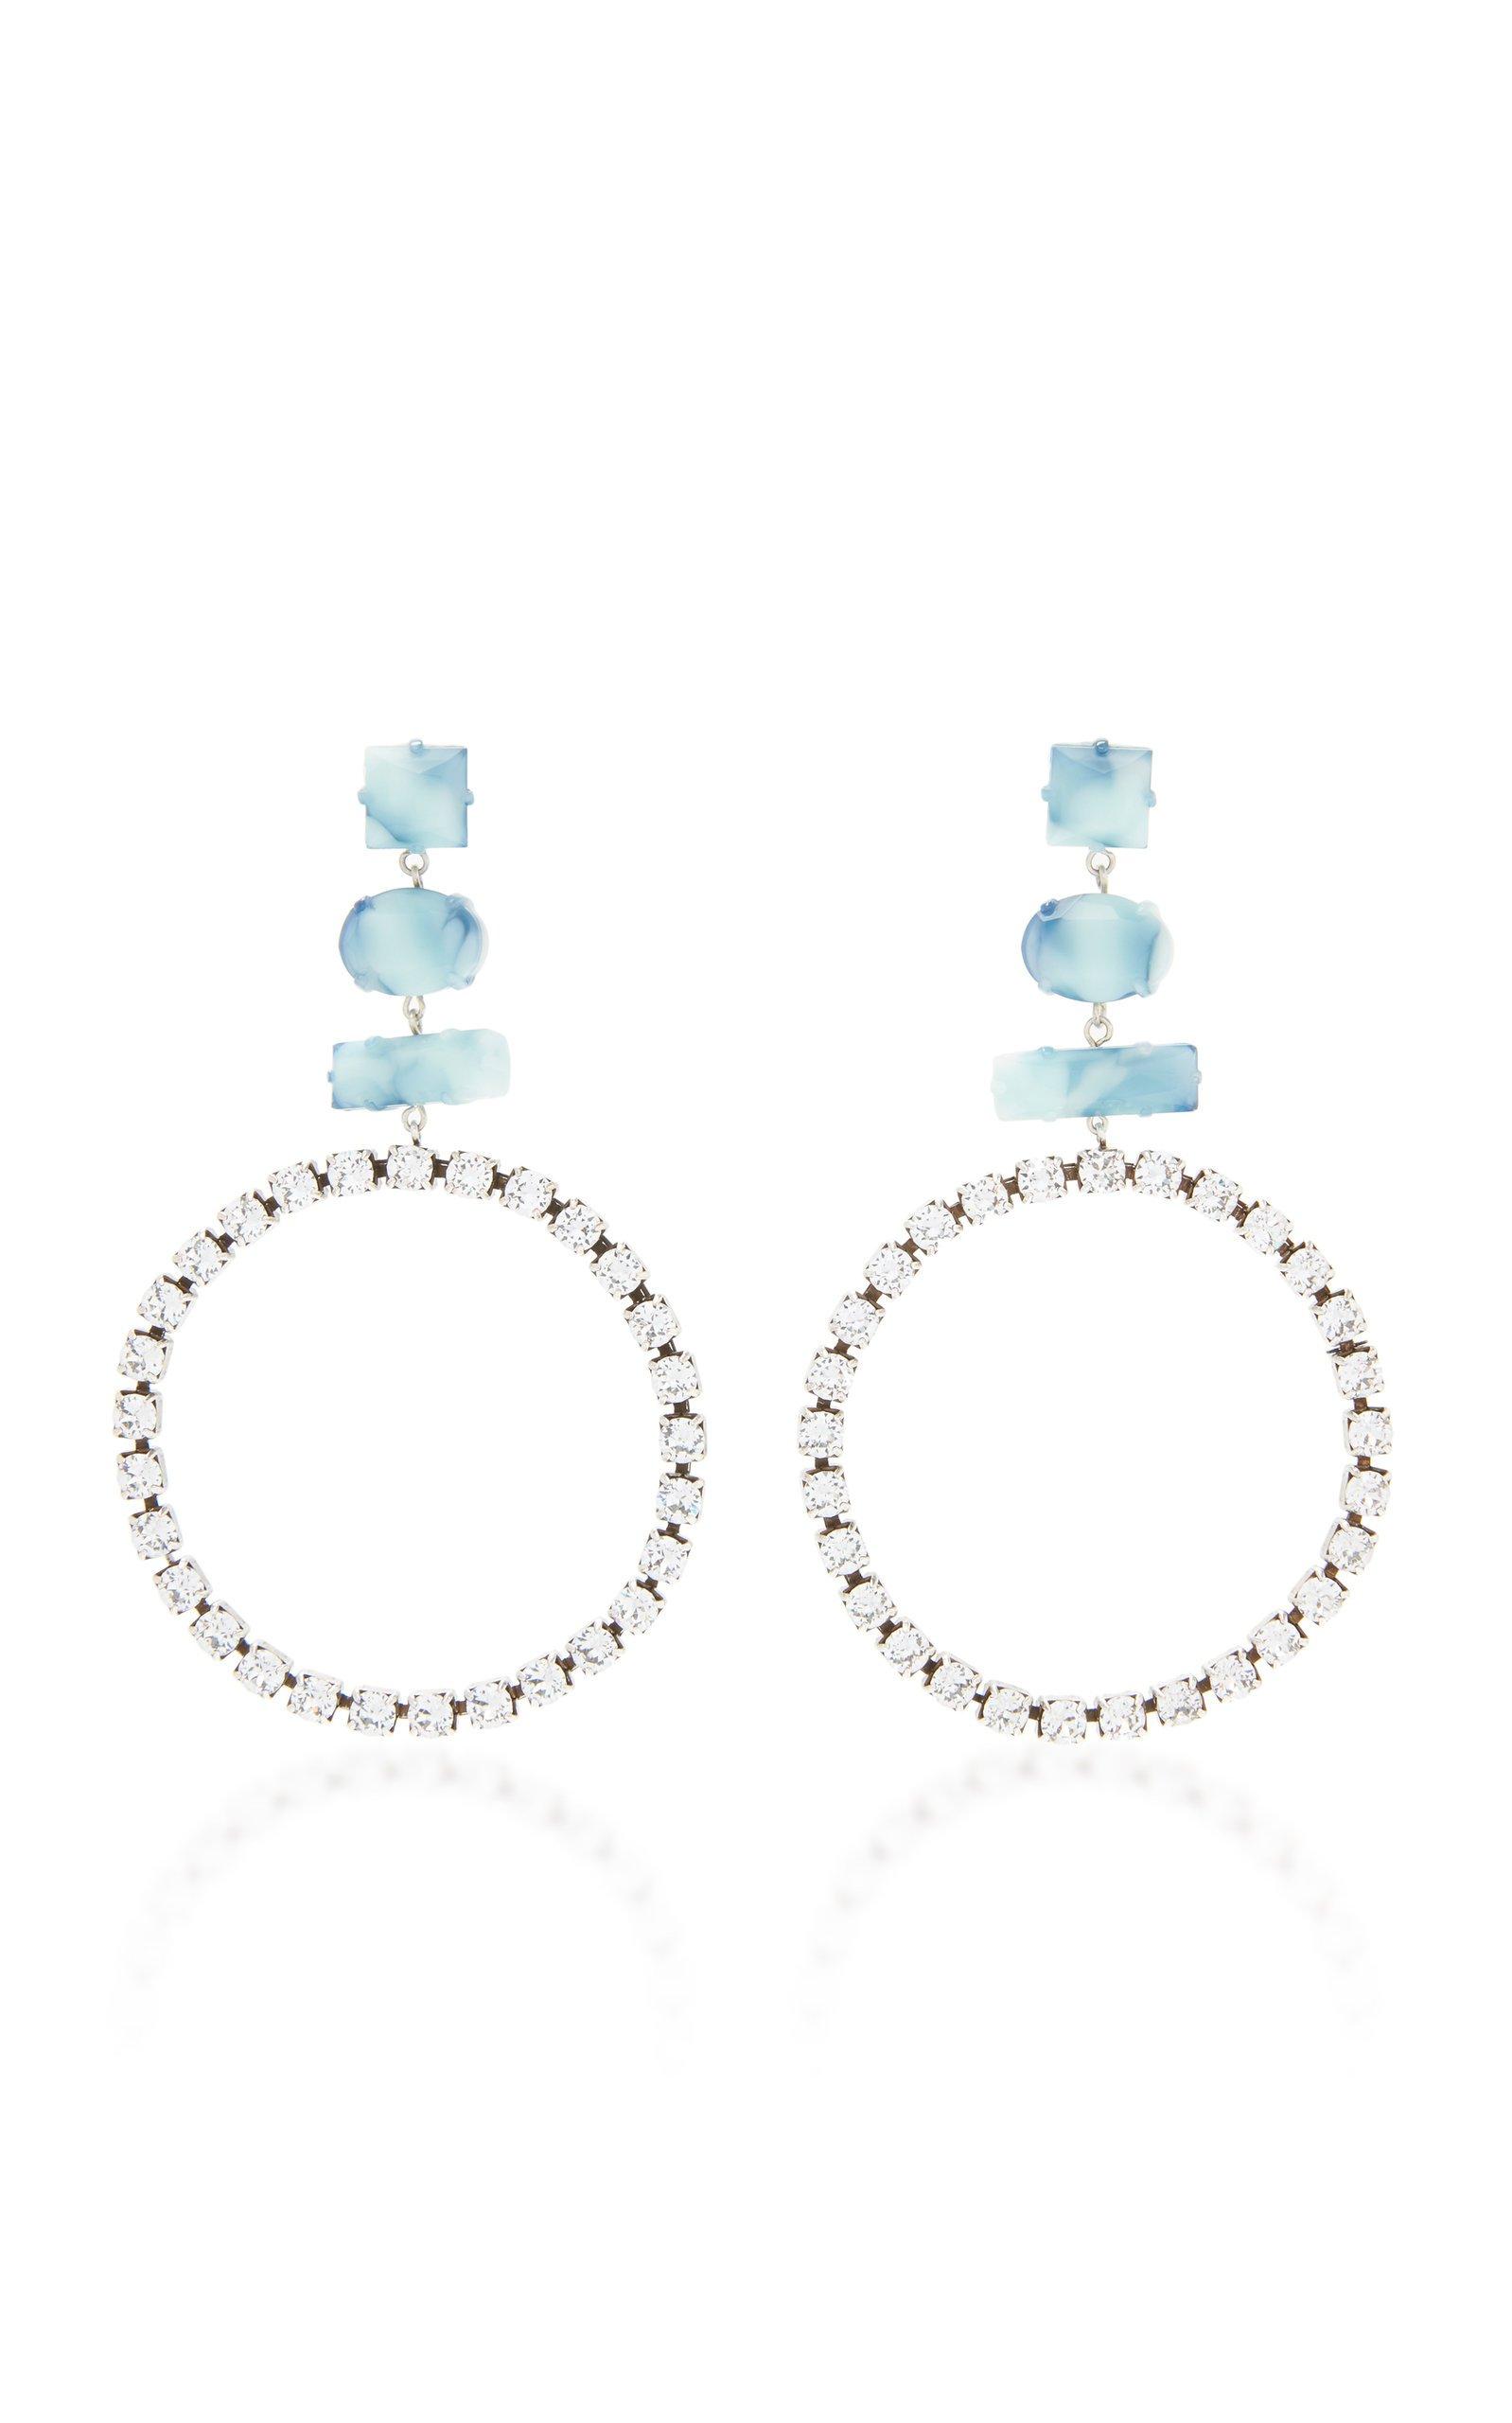 Silver-Tone, Swarovski Crystal And Resin Earrings by Isabel Marant   Moda Operandi